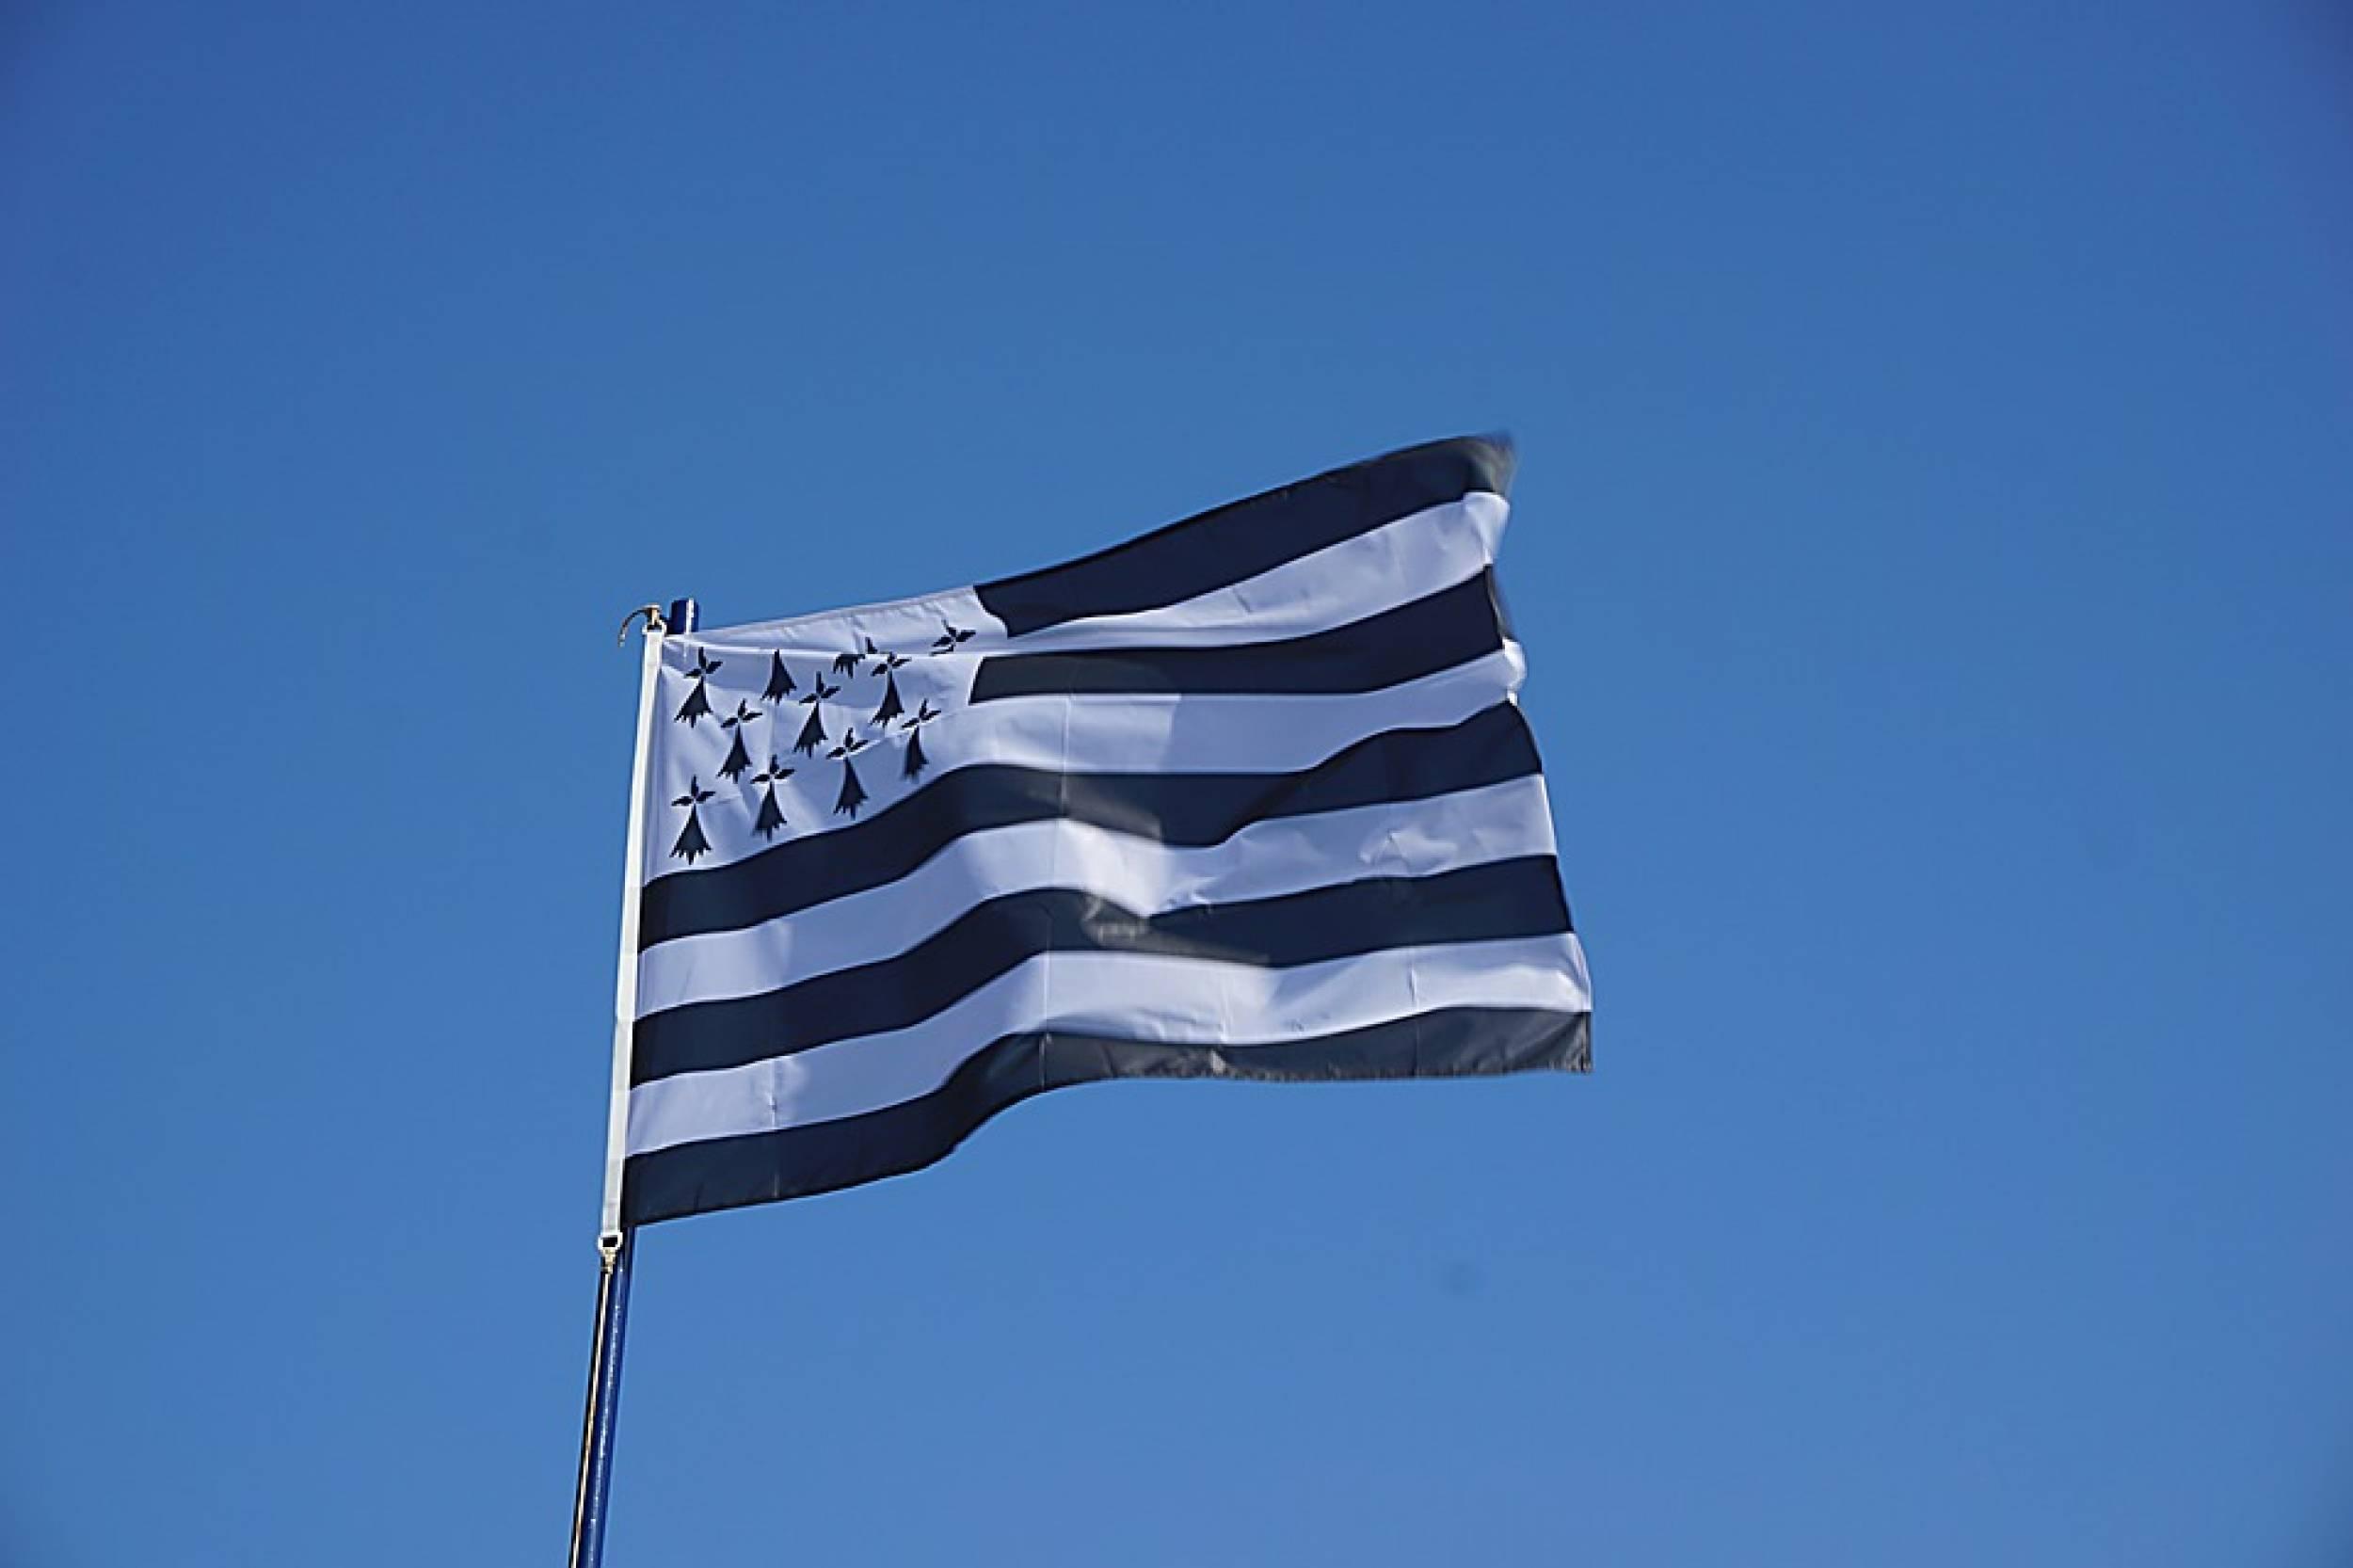 breton_credit-pixabay